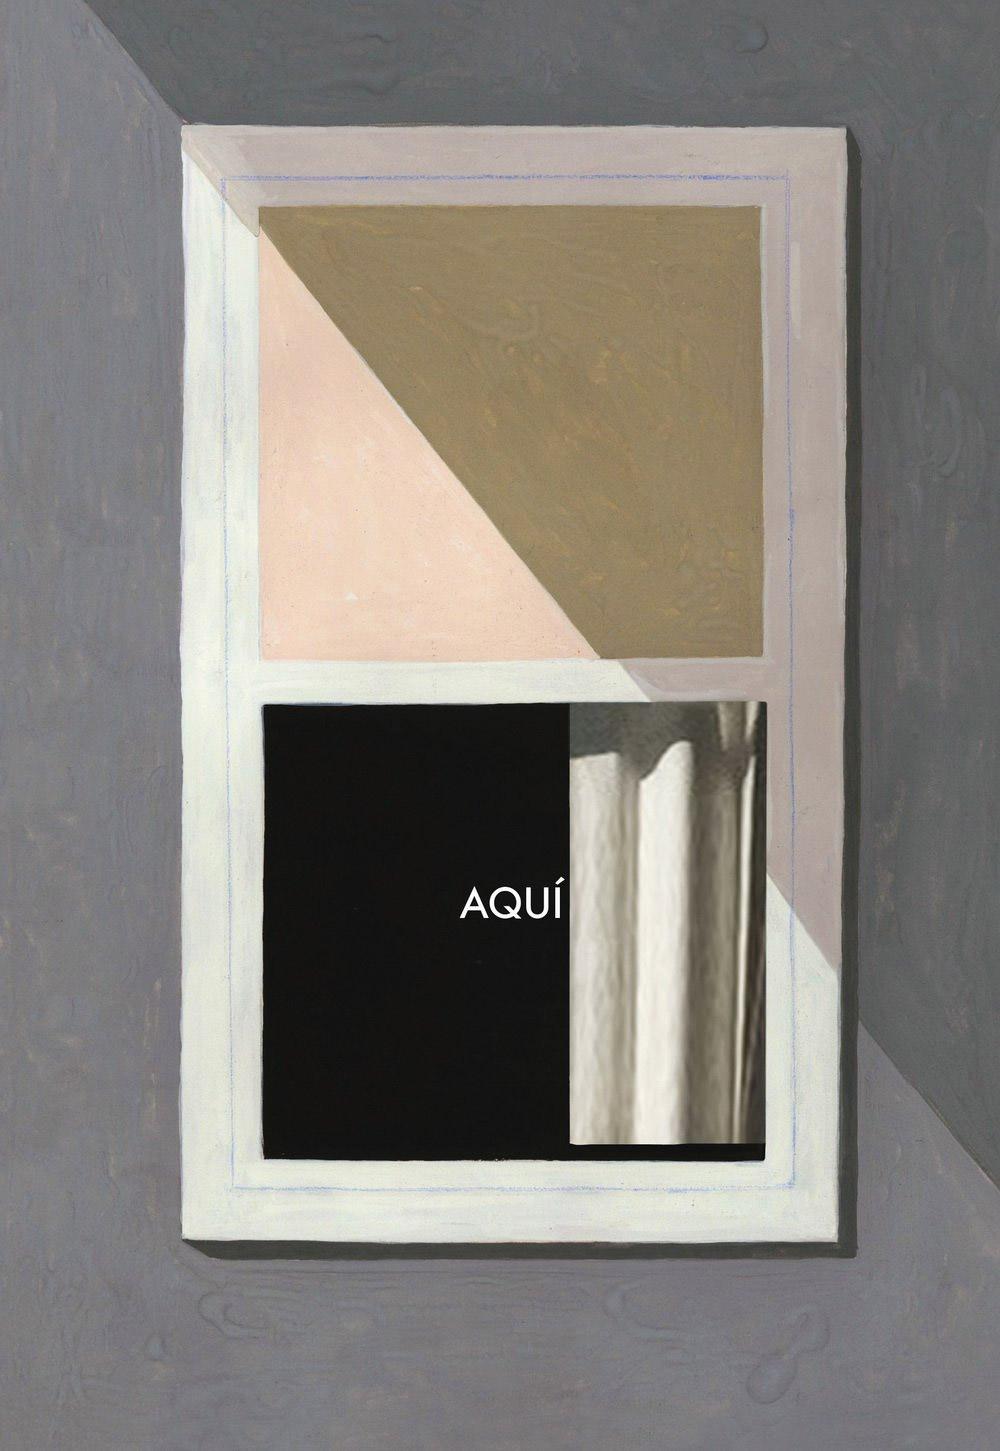 Aquí, Apócrifa magazine